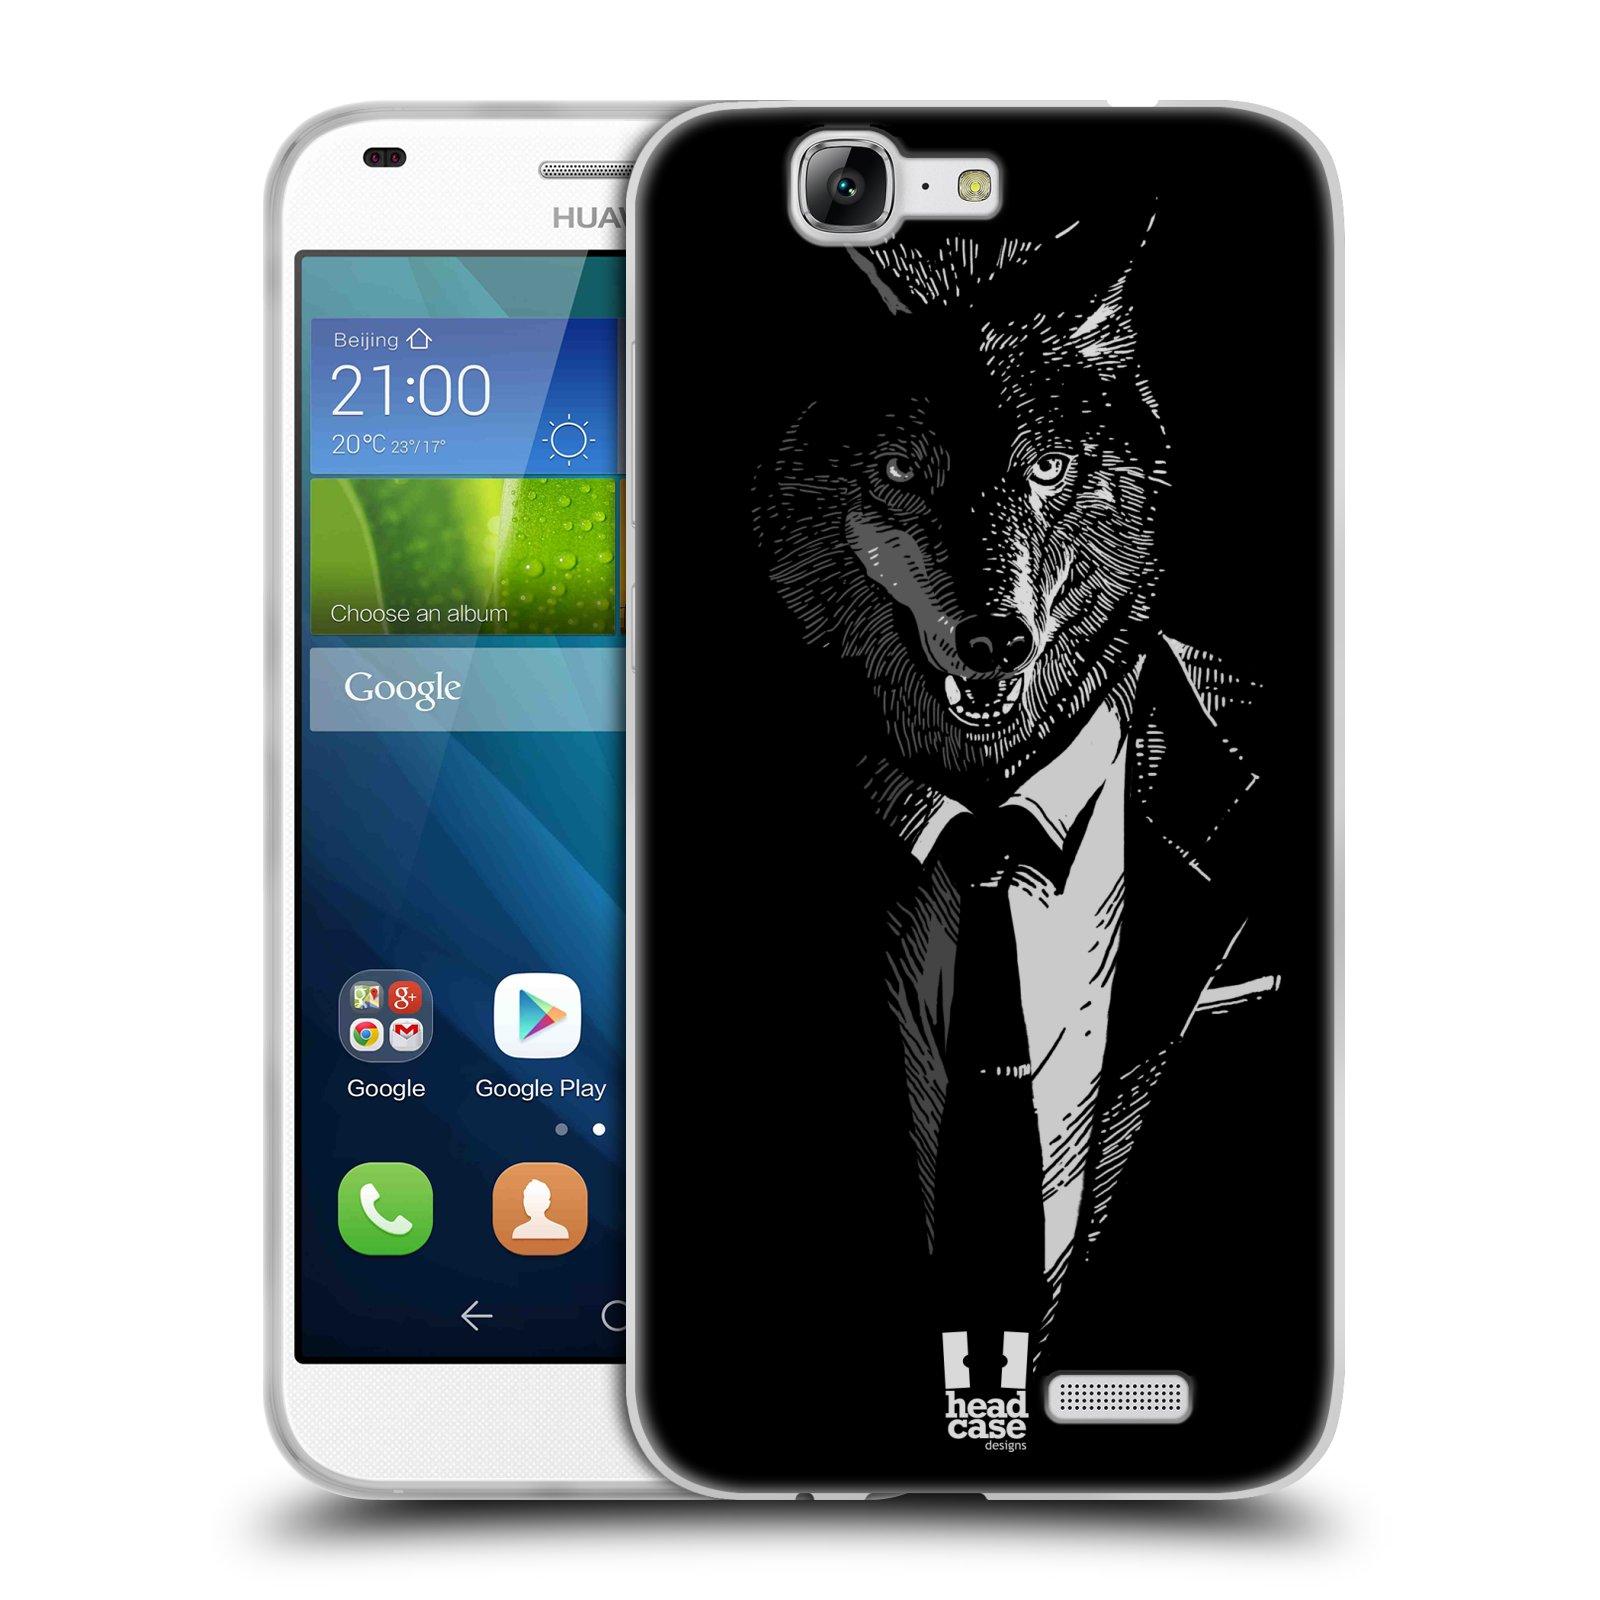 Silikonové pouzdro na mobil Huawei Ascend G7 HEAD CASE VLK V KVÁDRU (Silikonový kryt či obal na mobilní telefon Huawei Ascend G7)